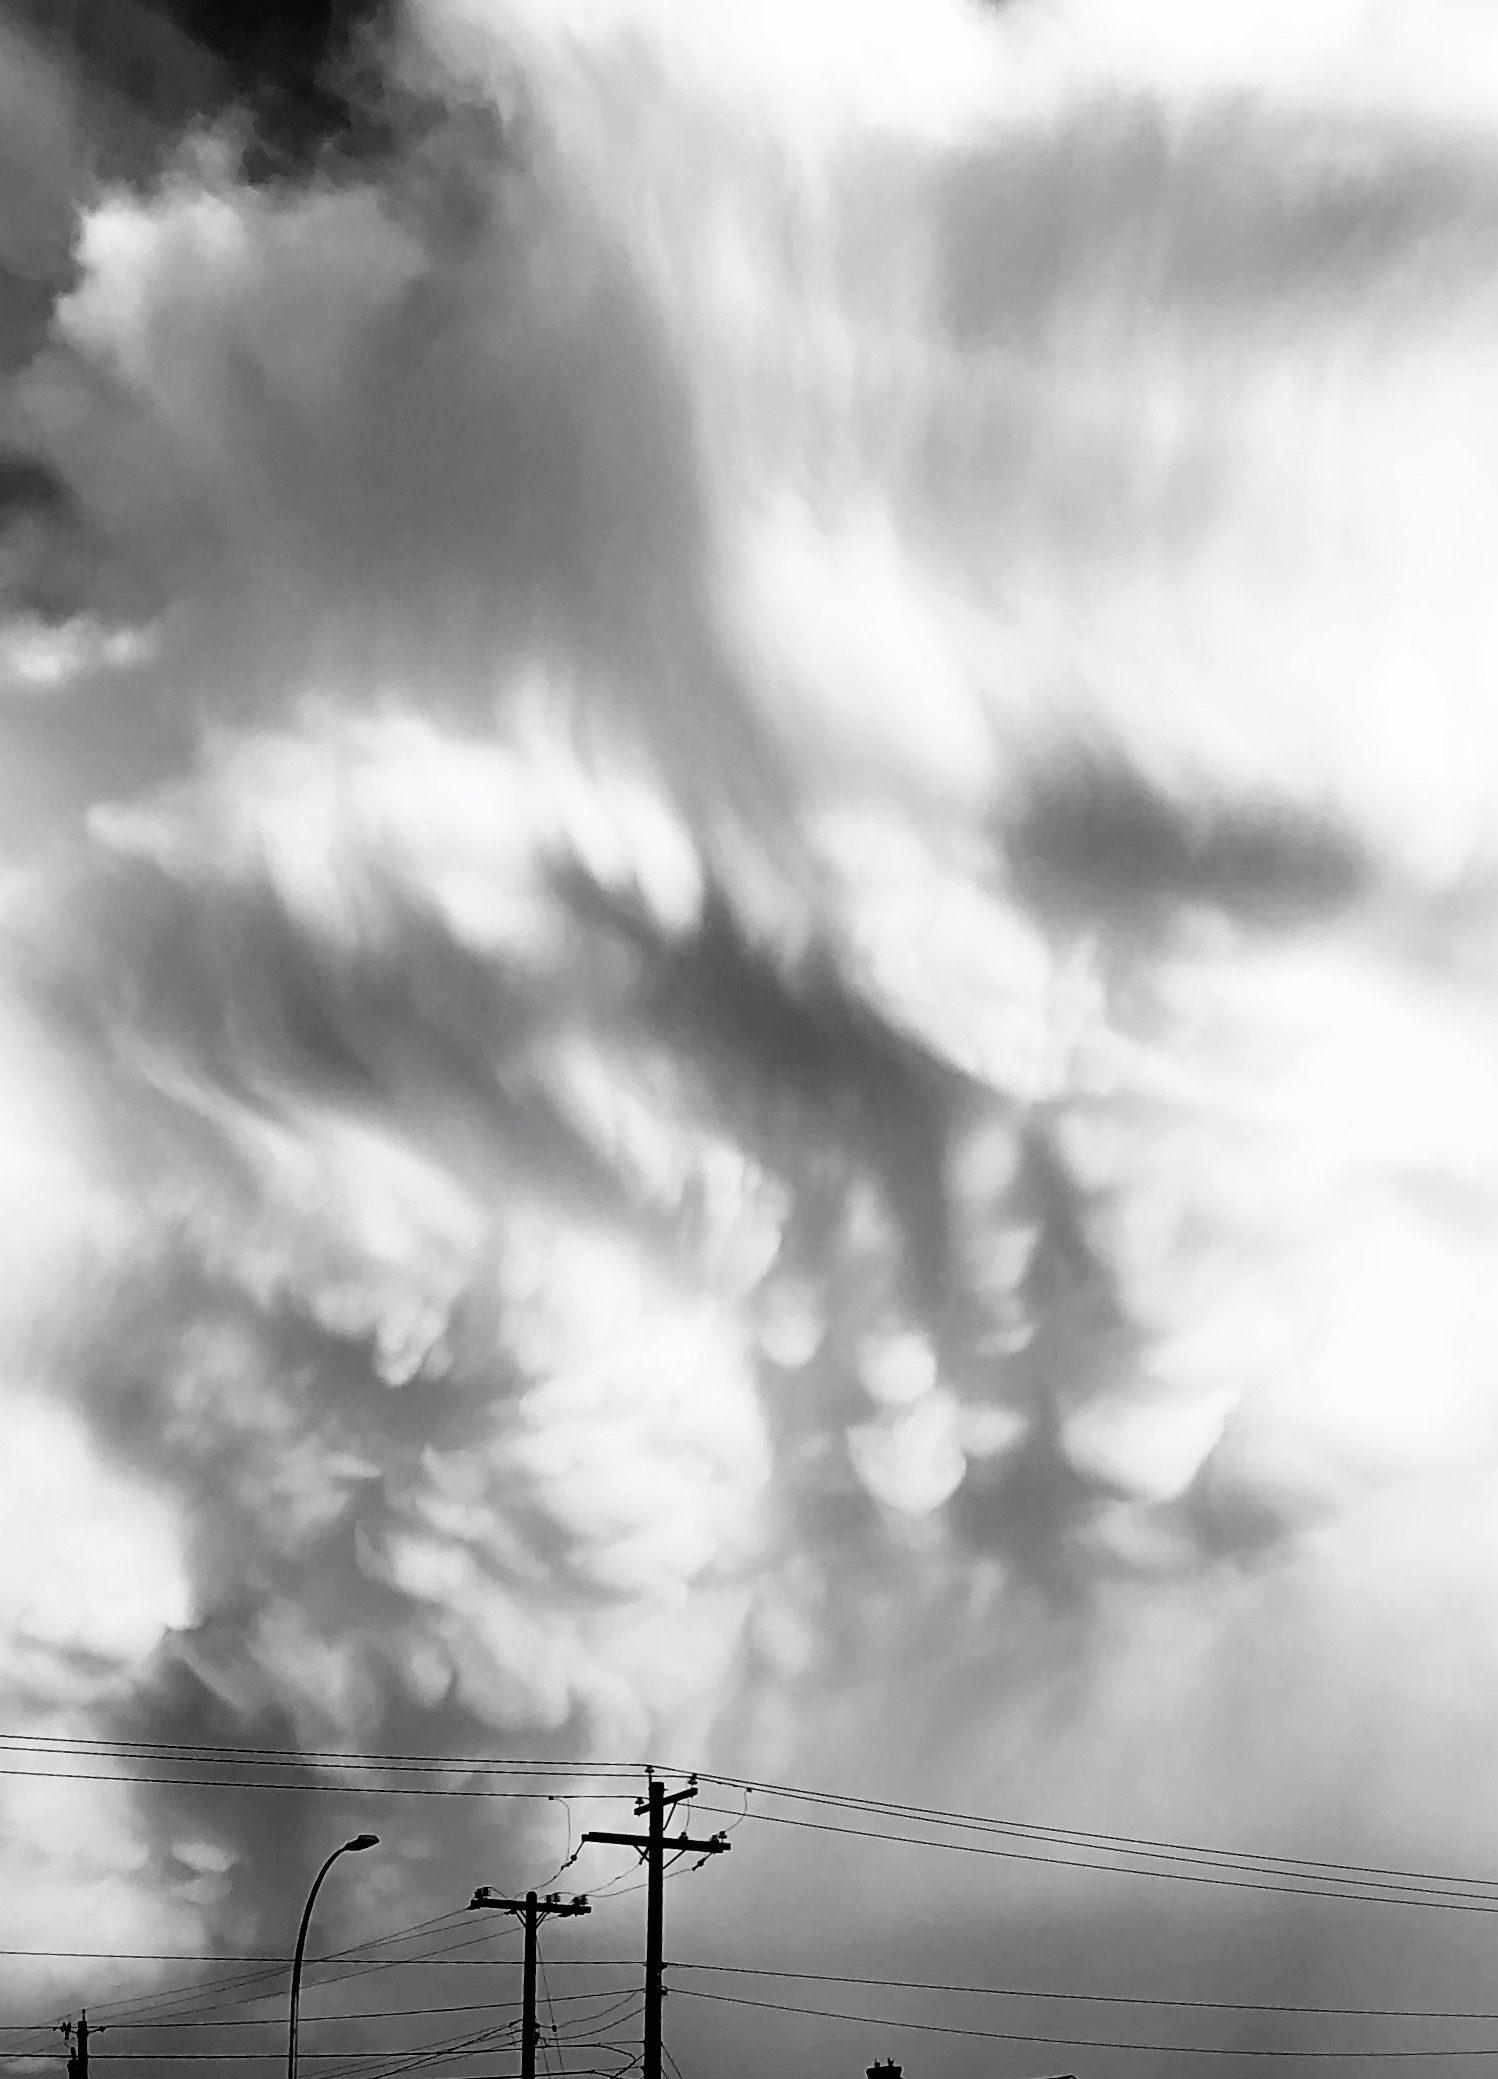 Dallas Seitz, Storm, 2020, Courtesy of IMT Gallery